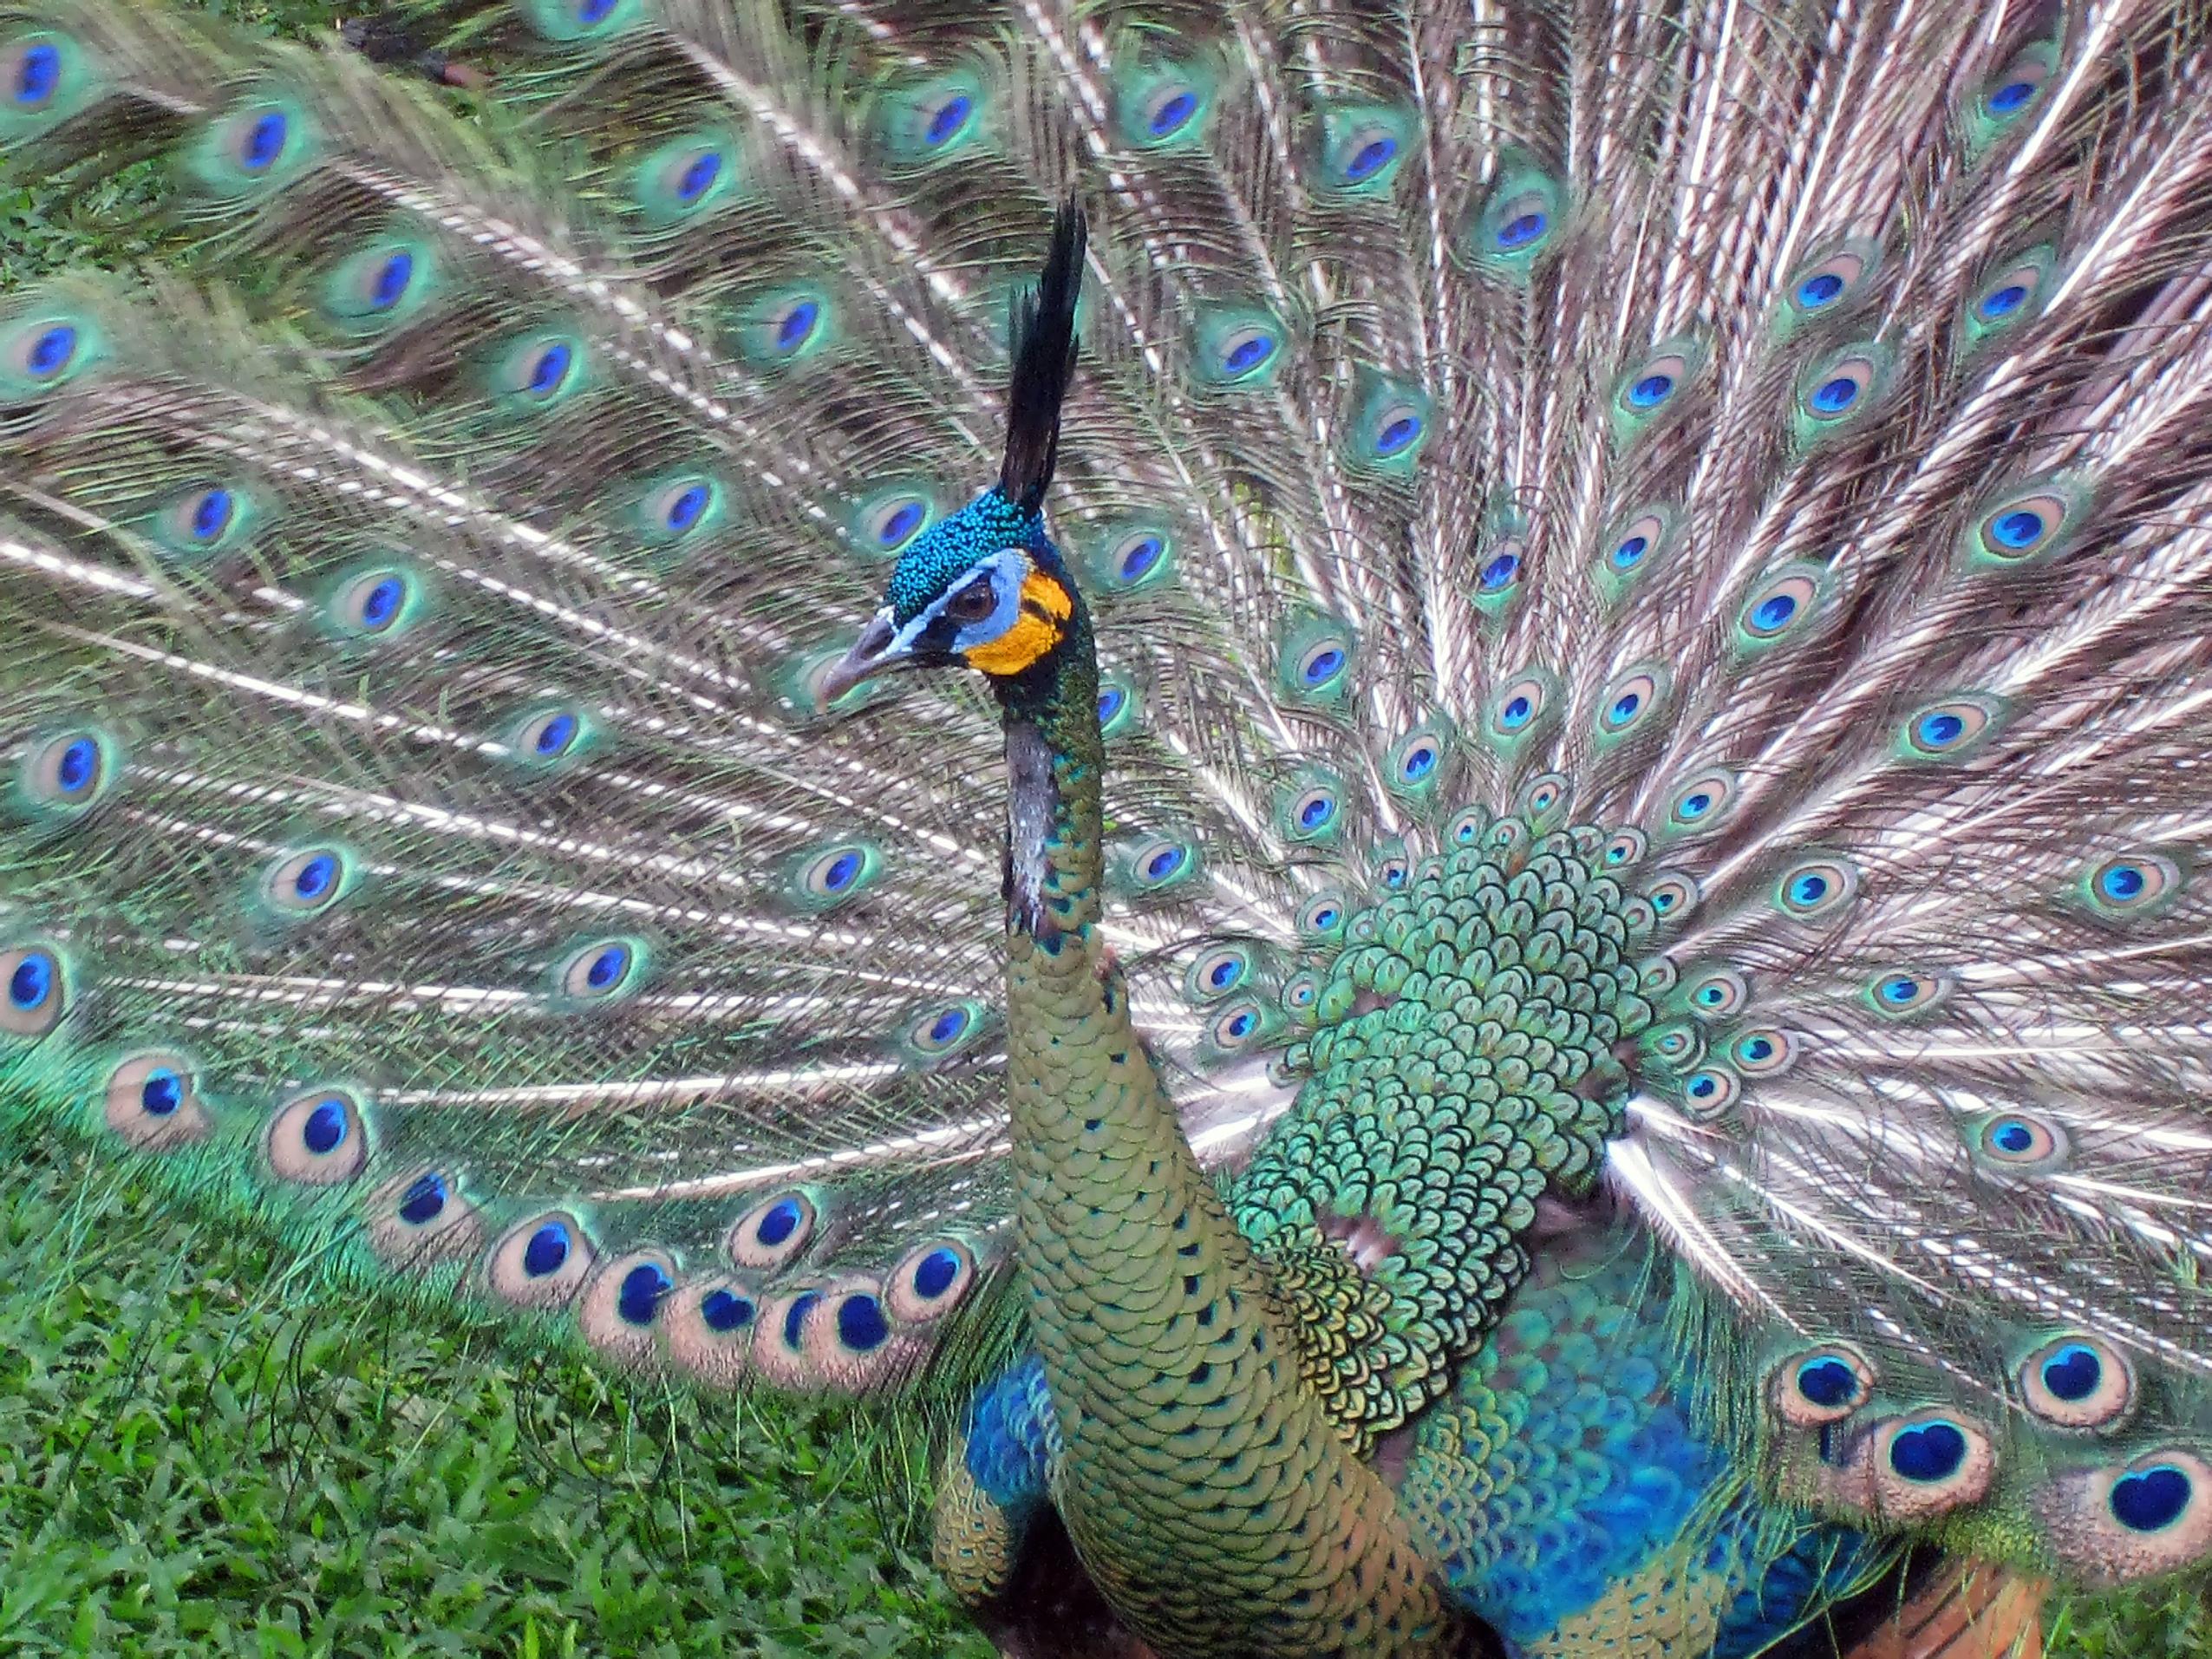 File:Javan Green Peafowl (Pavo muticus) in TMII Birdpark.jpg